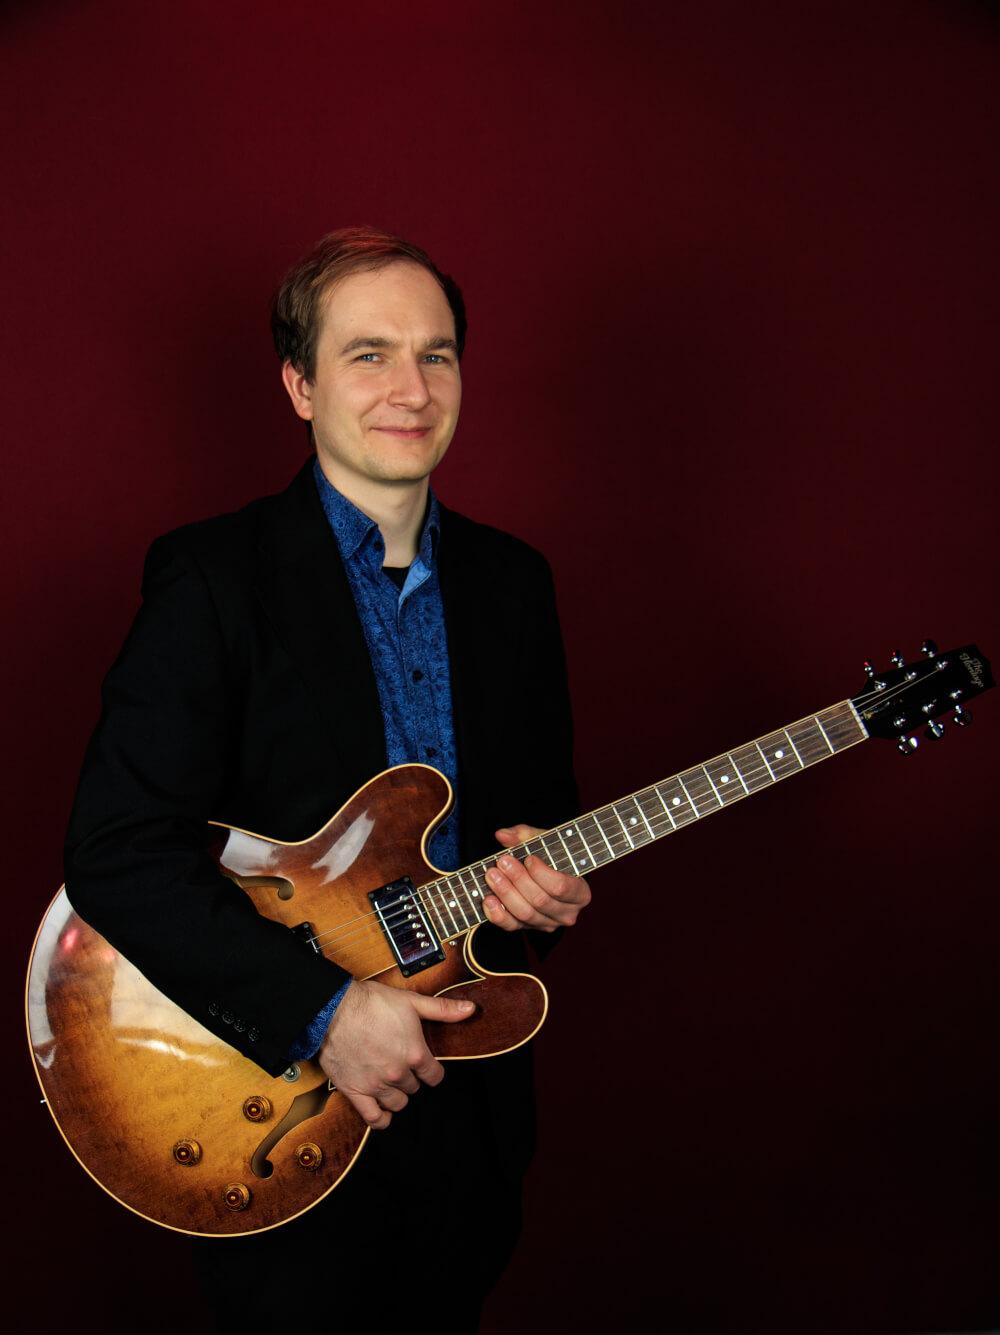 christian-haupt-gitarre-jazzduo-leipzig